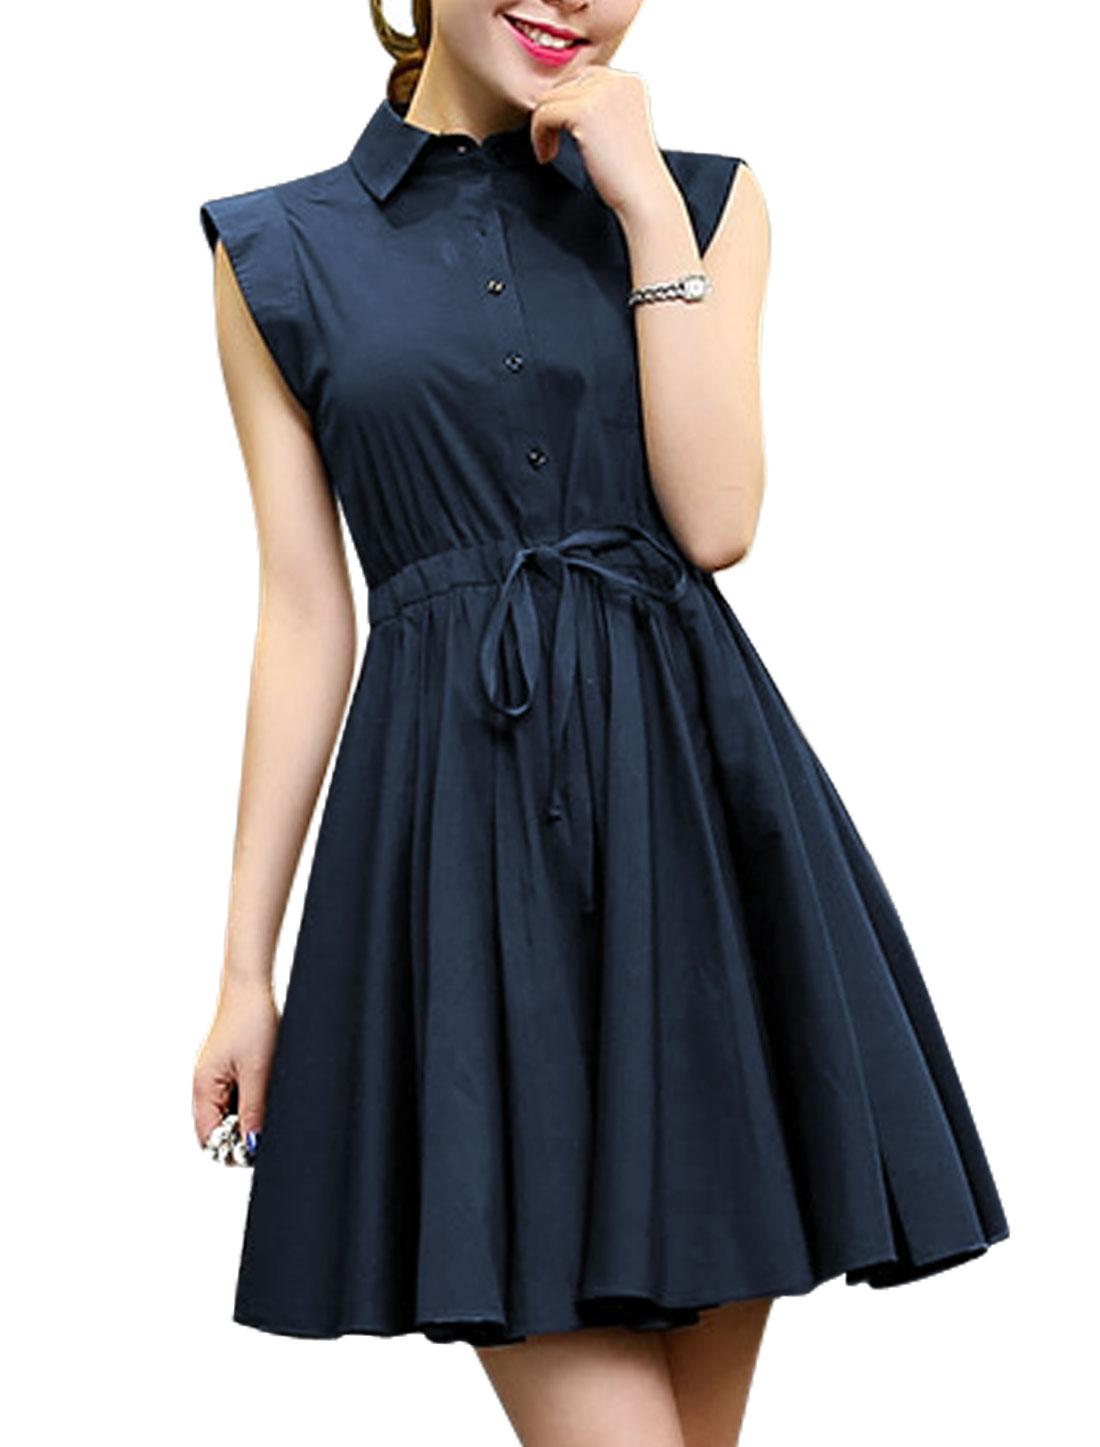 Ladies Point Collar Sleeveless Drawstring Unlined Shirt Dress Navy Blue M